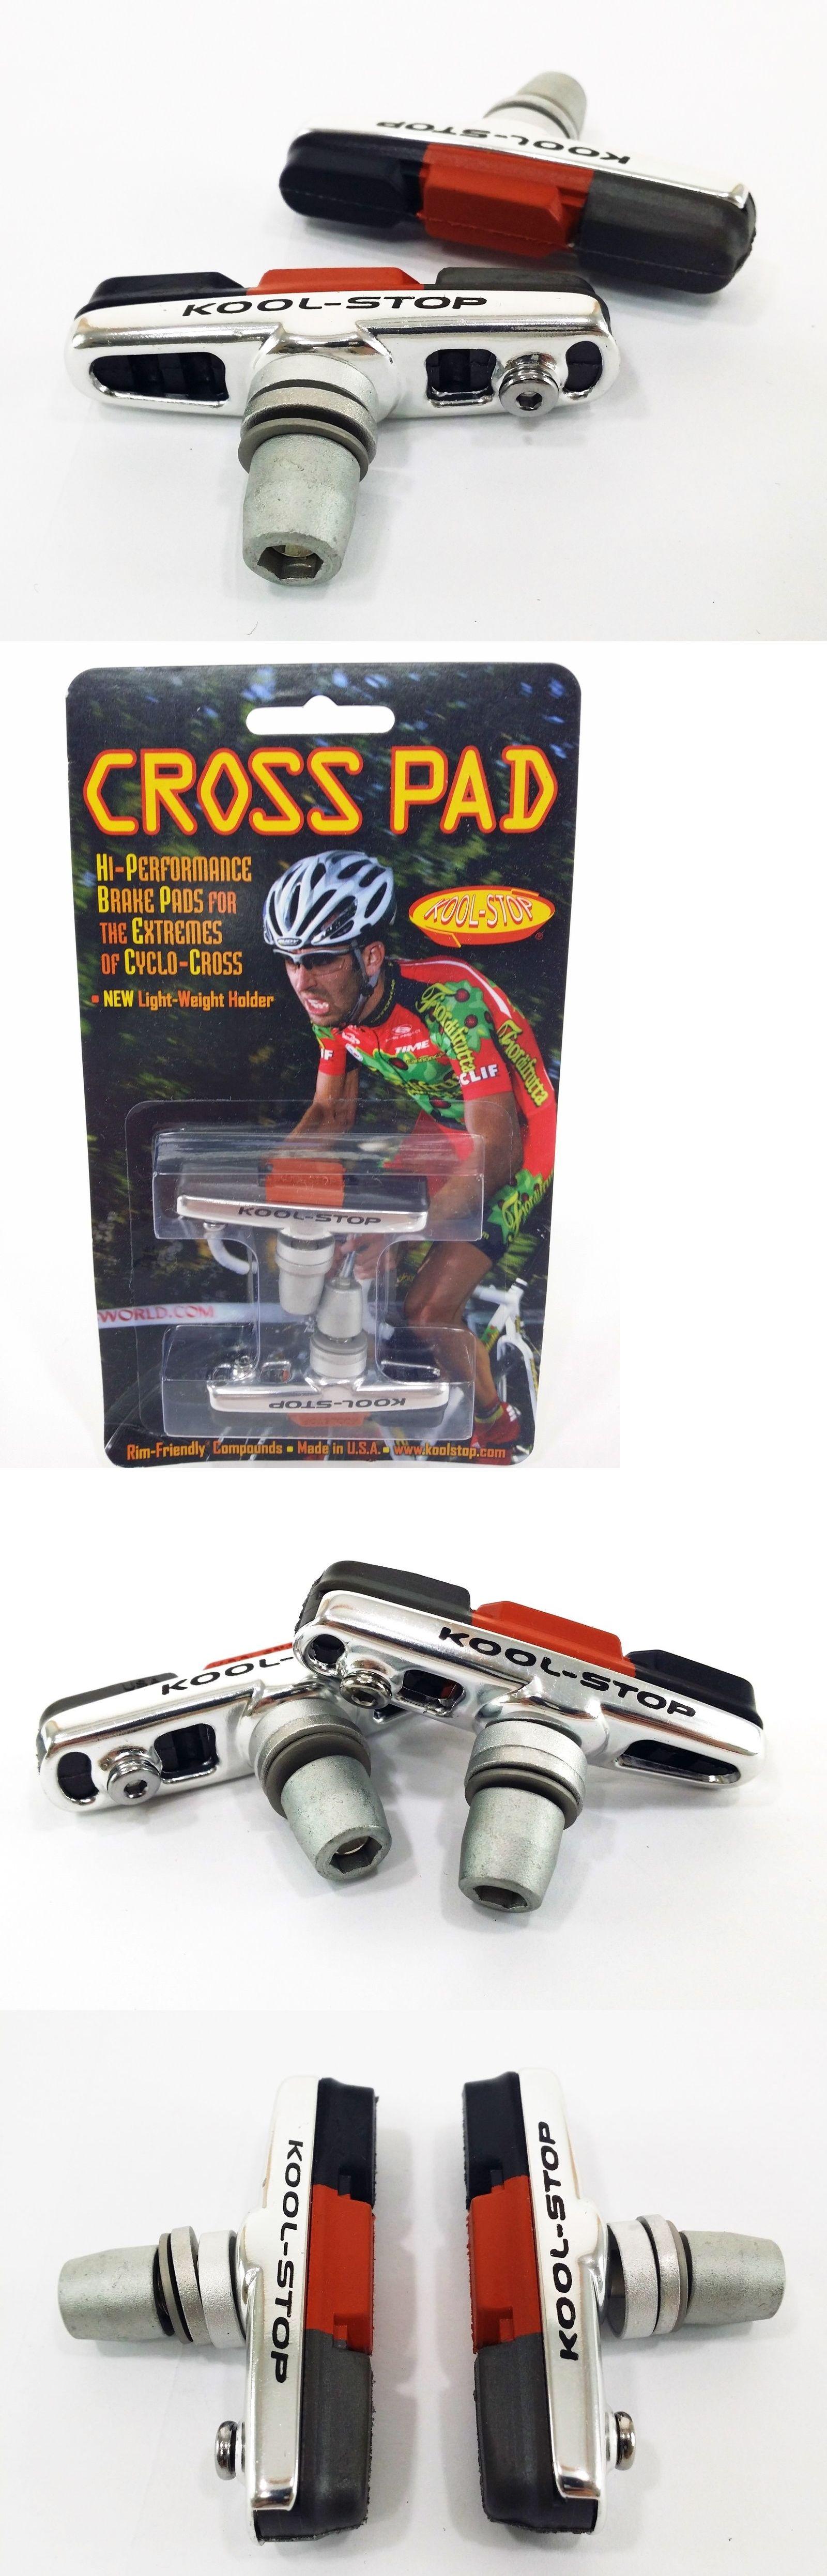 Kool-Stop Dura2 Cross Pad Threaded Cyclocross Triple-Compound Bike Brake Pads CX